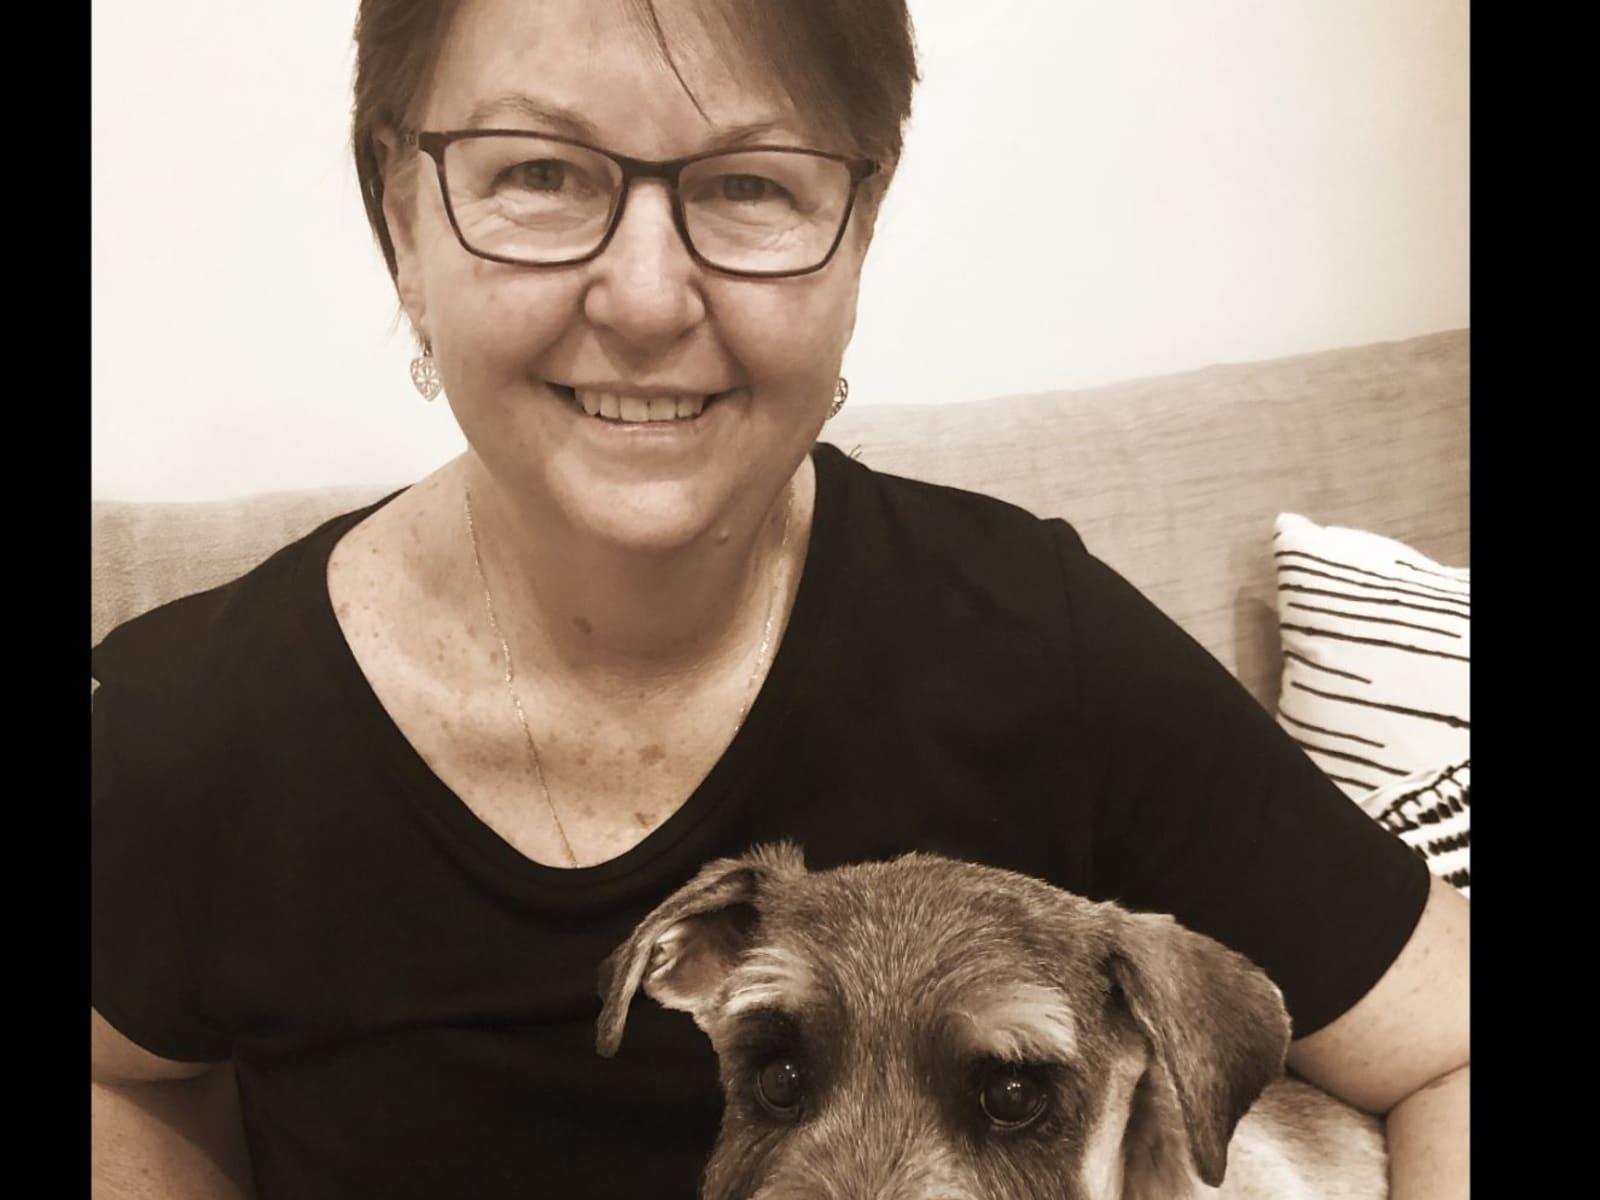 Jennifer from Brisbane, Queensland, Australia